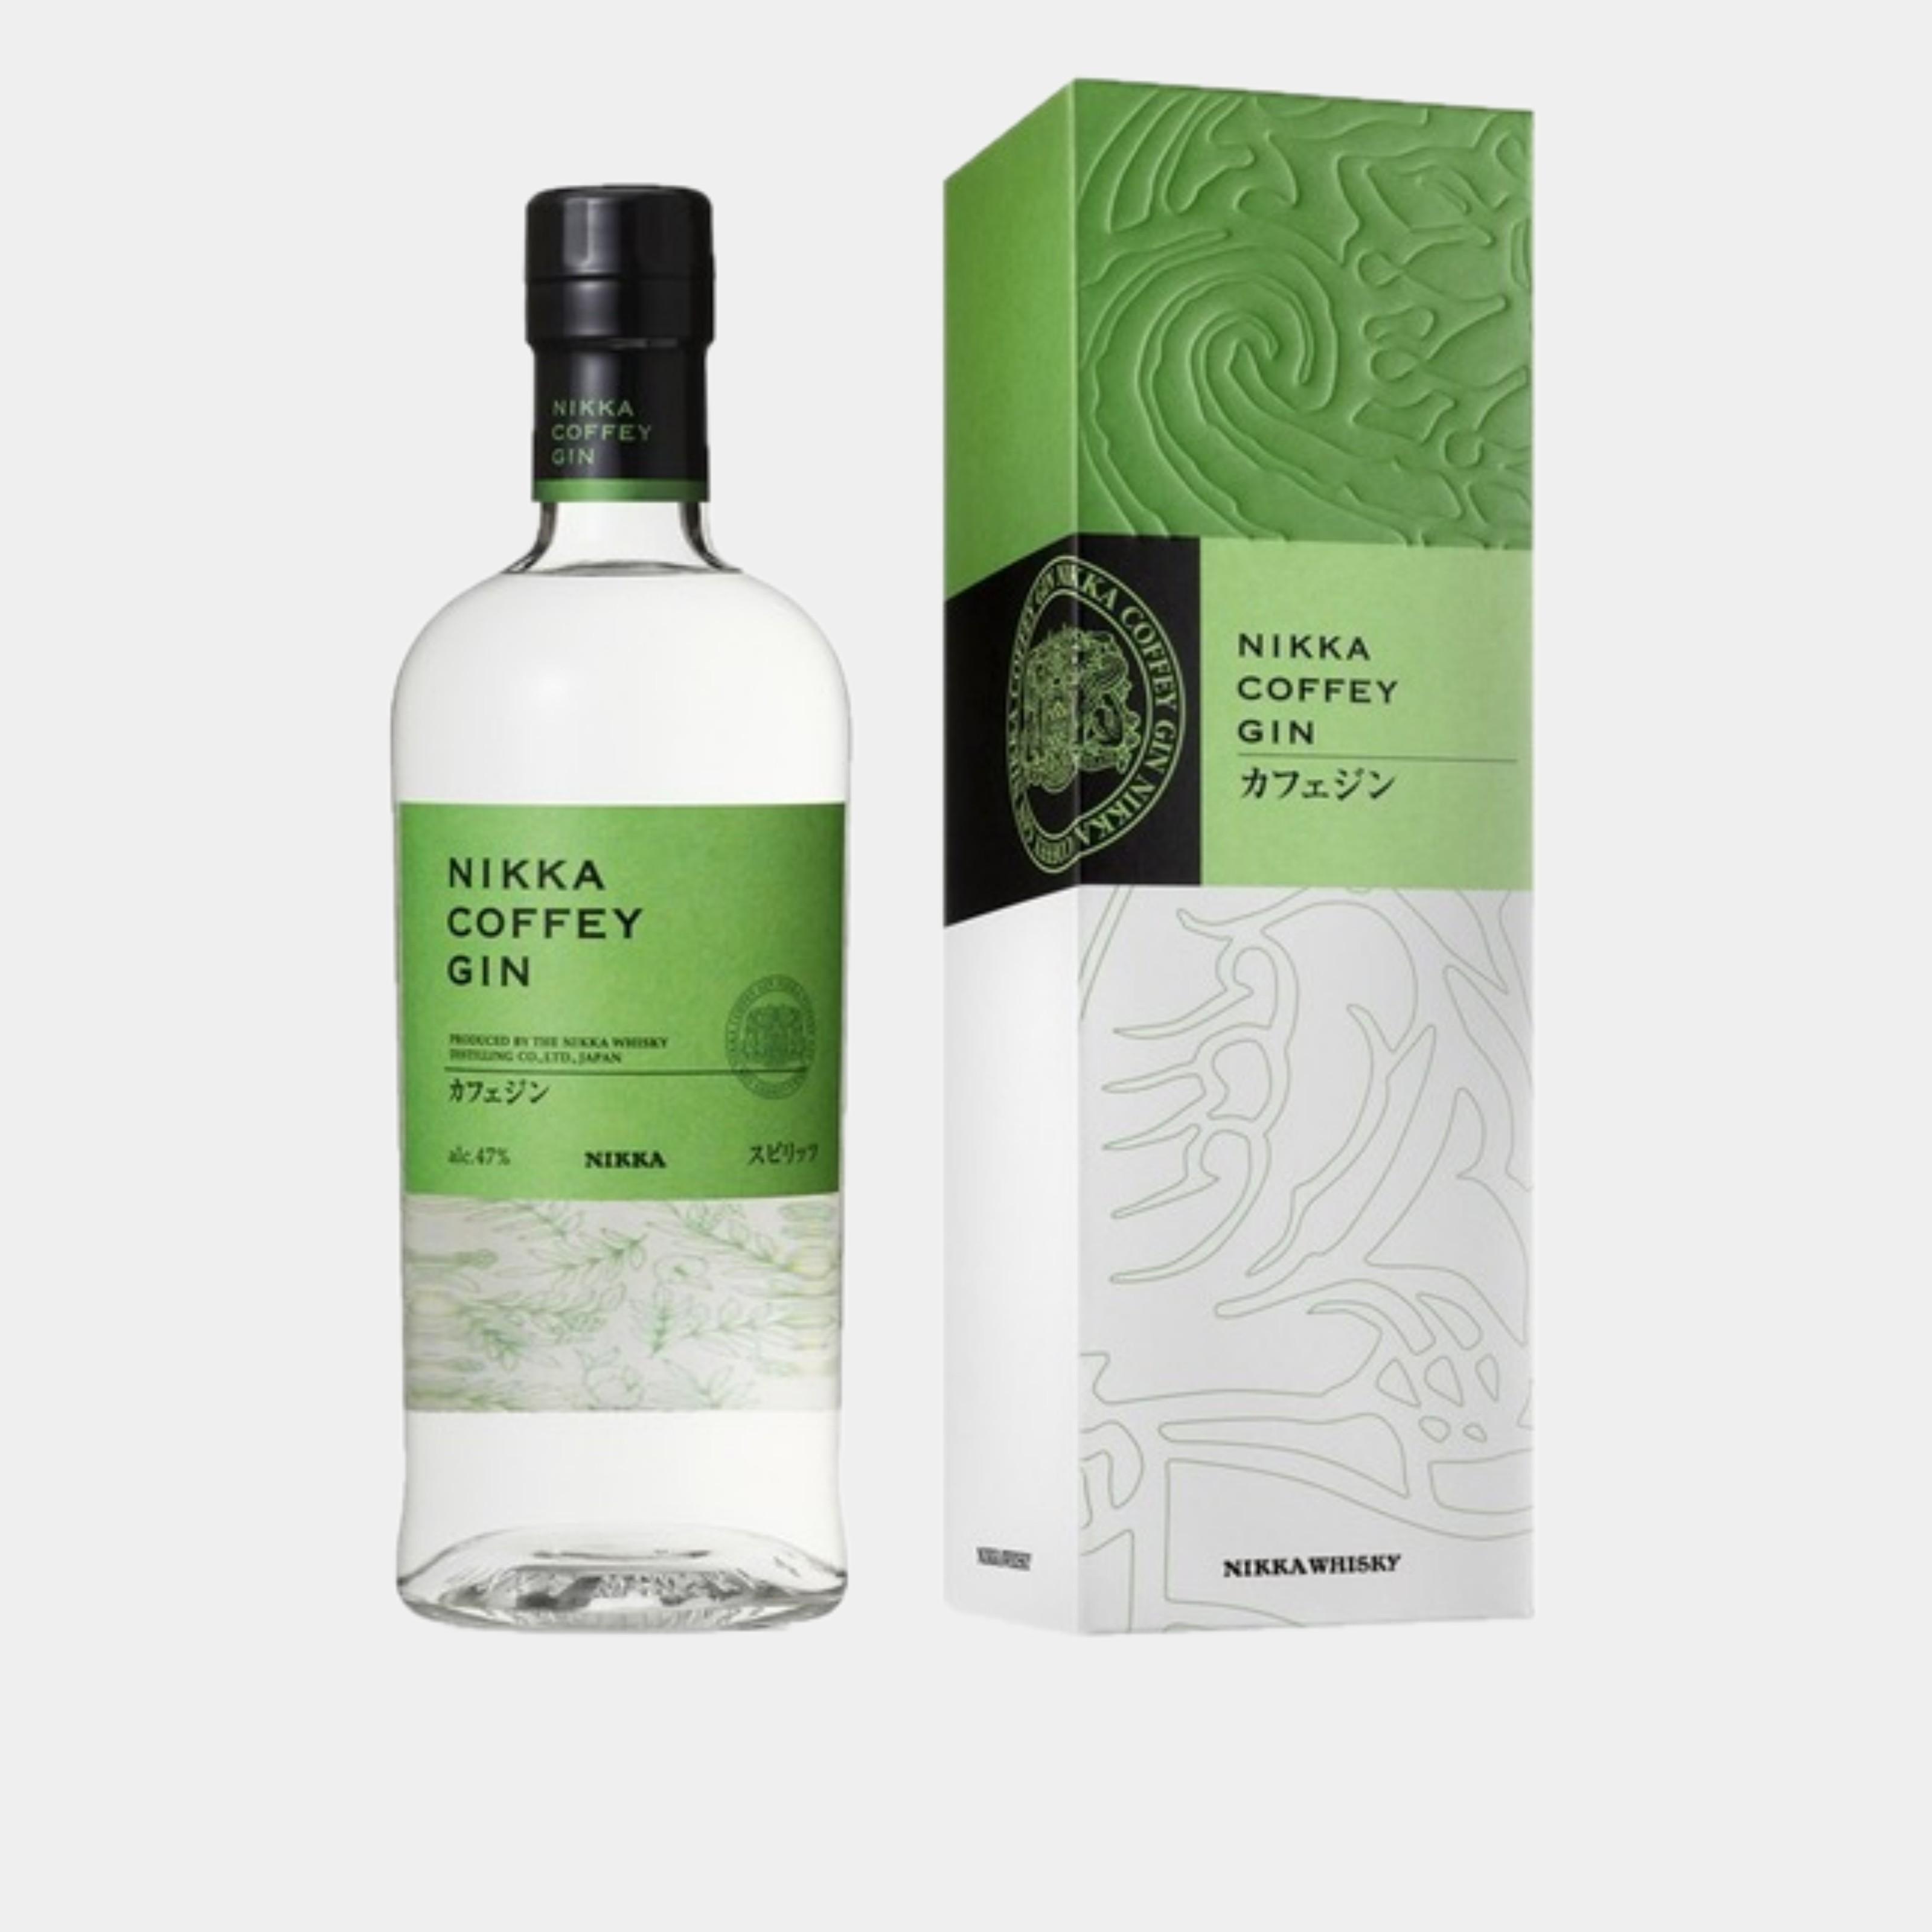 Nikka Coffey Gin 0.7l 47% Alk.